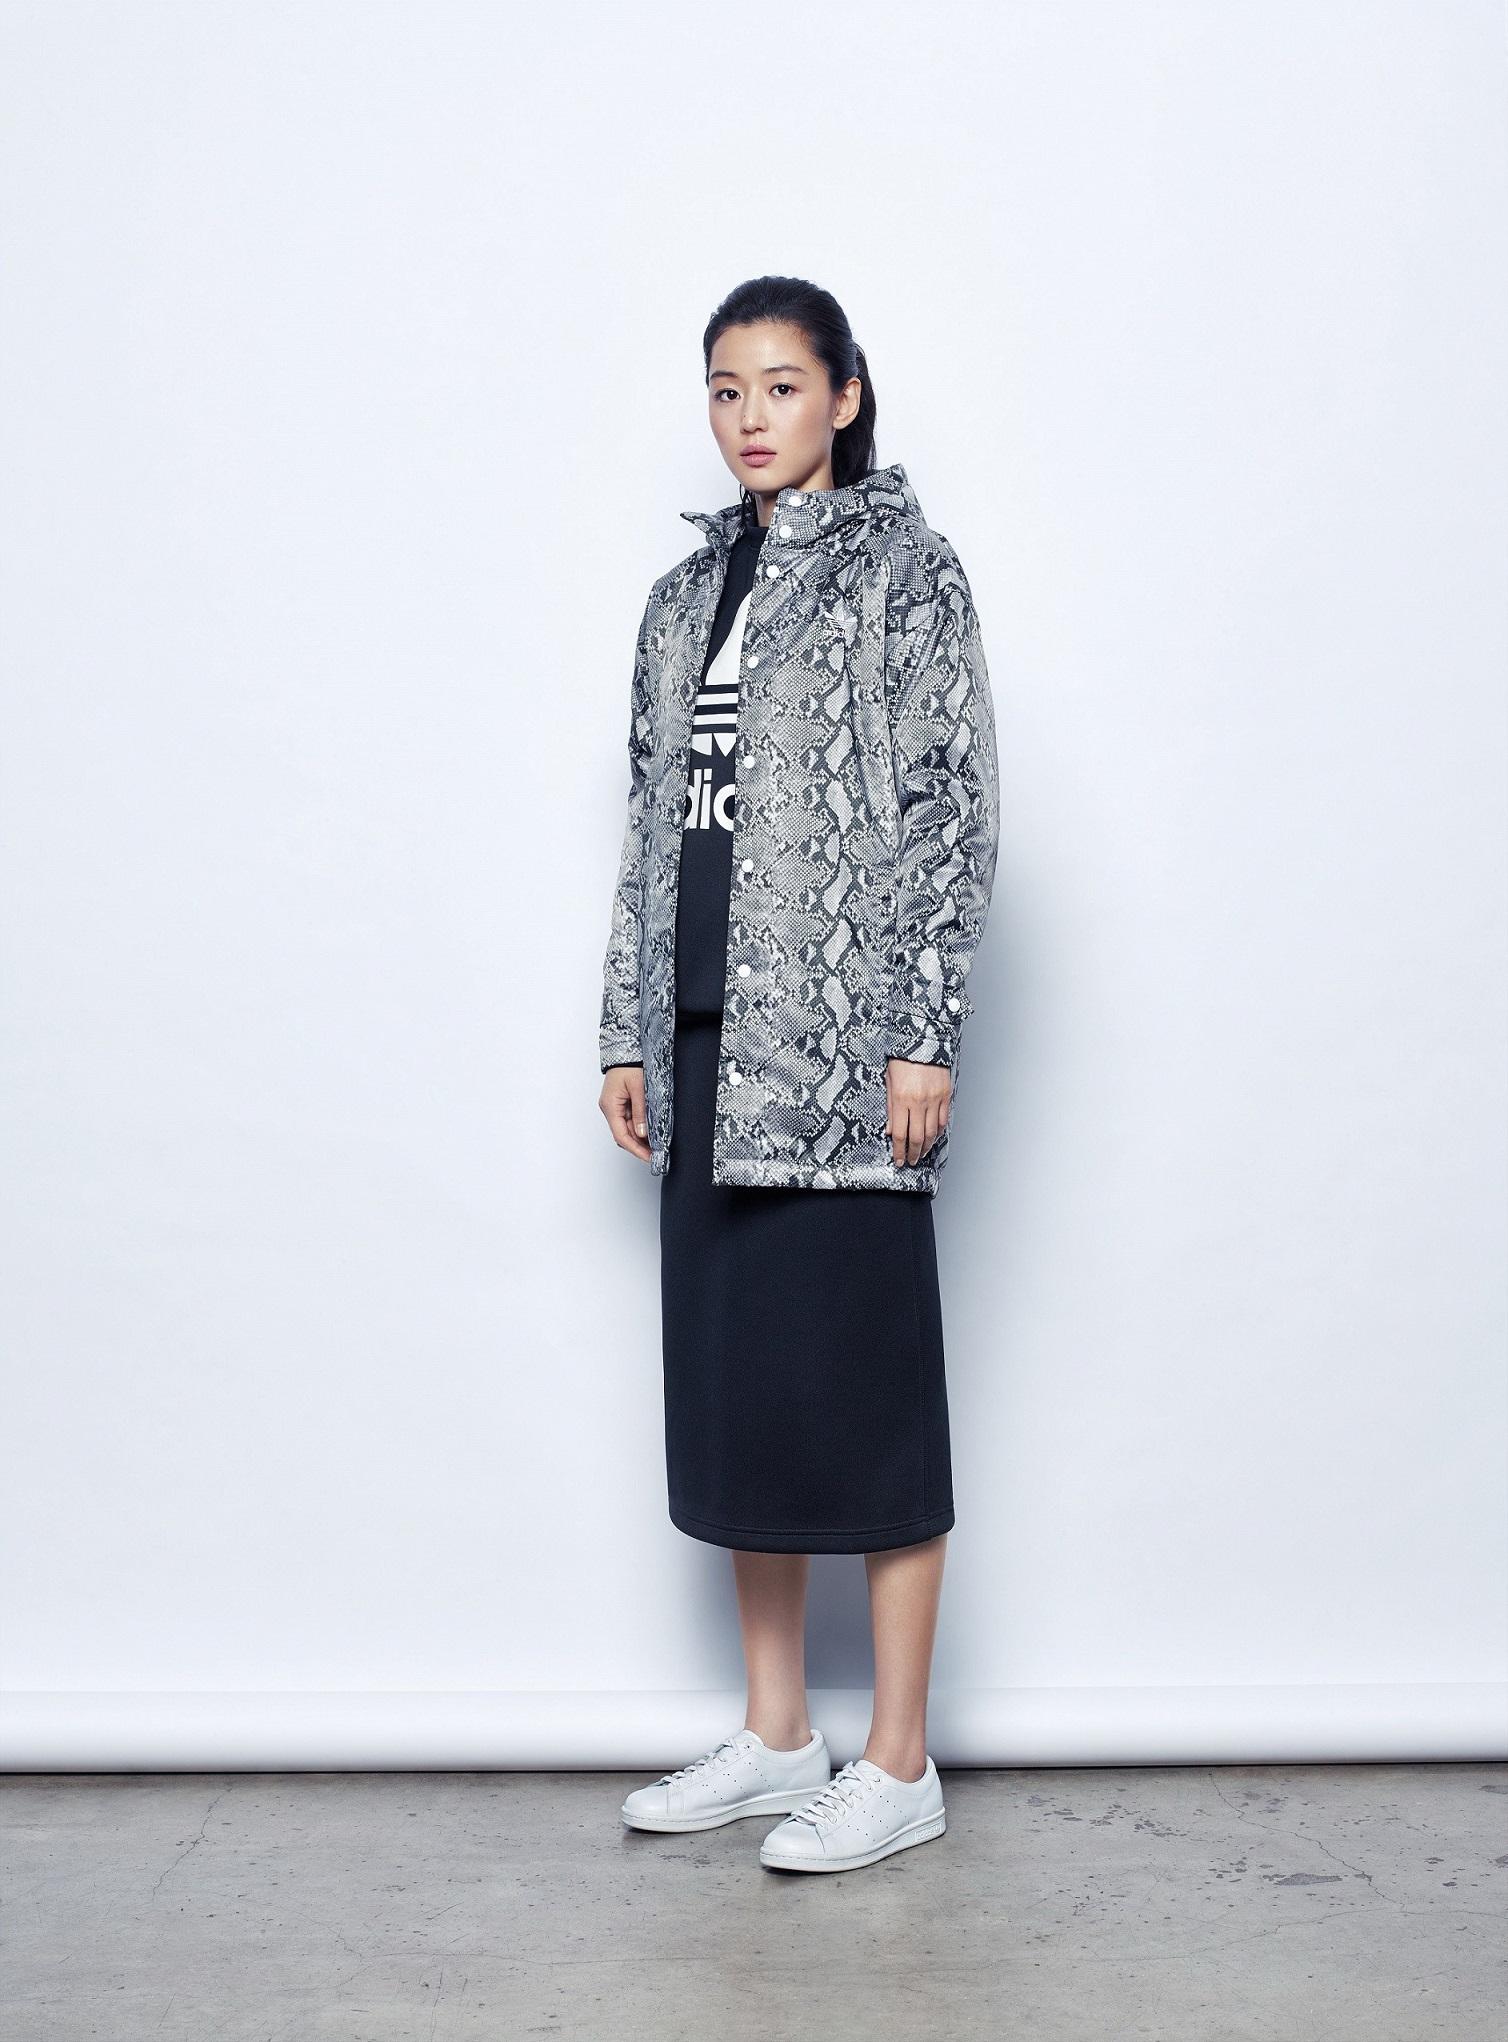 Adidas Originals By Hyke 15 秋冬系列 全智賢形象照 Kenlu Net